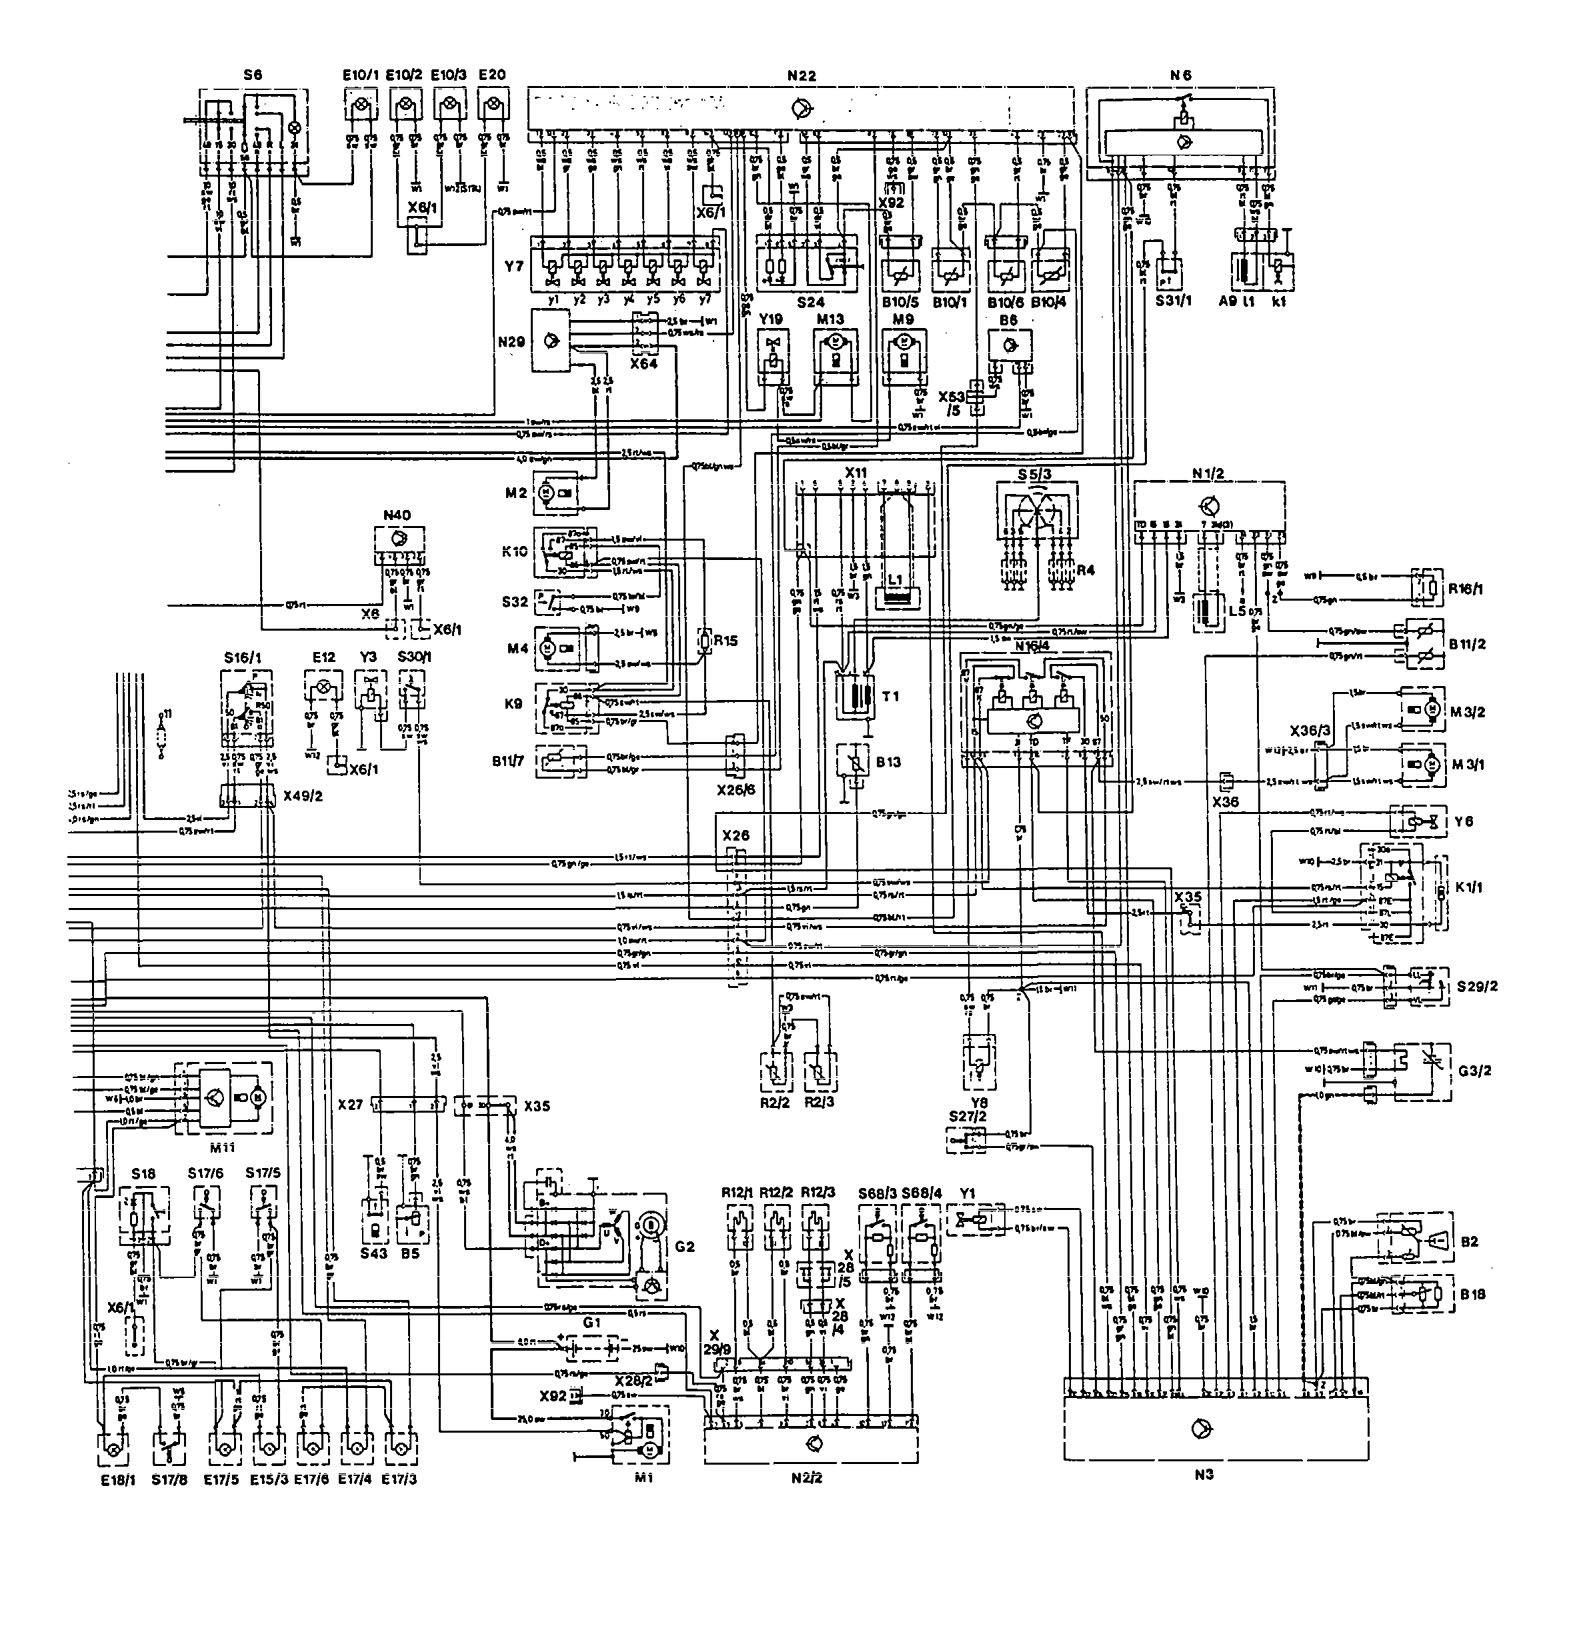 [SODI_2457]   Mercedes-Benz 300E (1992) - wiring diagrams - igniition - Carknowledge.info | Mercedes Benz 300e Engine Diagram |  | Carknowledge.info